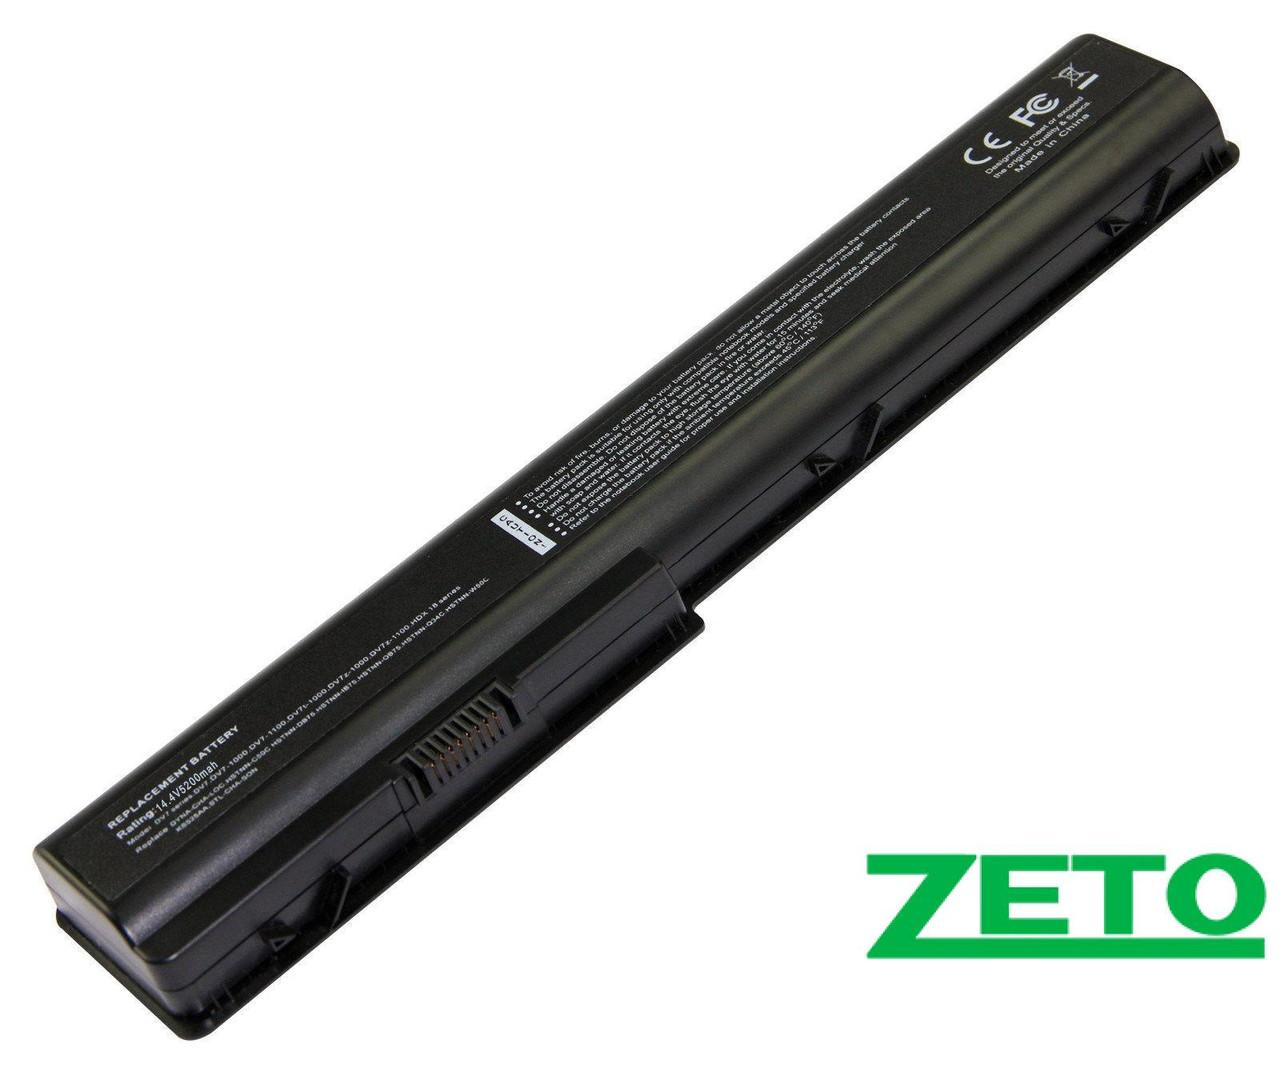 Аккумулятор HP CQ71, Pavilion DV7, HSTNN-IB75 (14,4V 5200mAh черная)